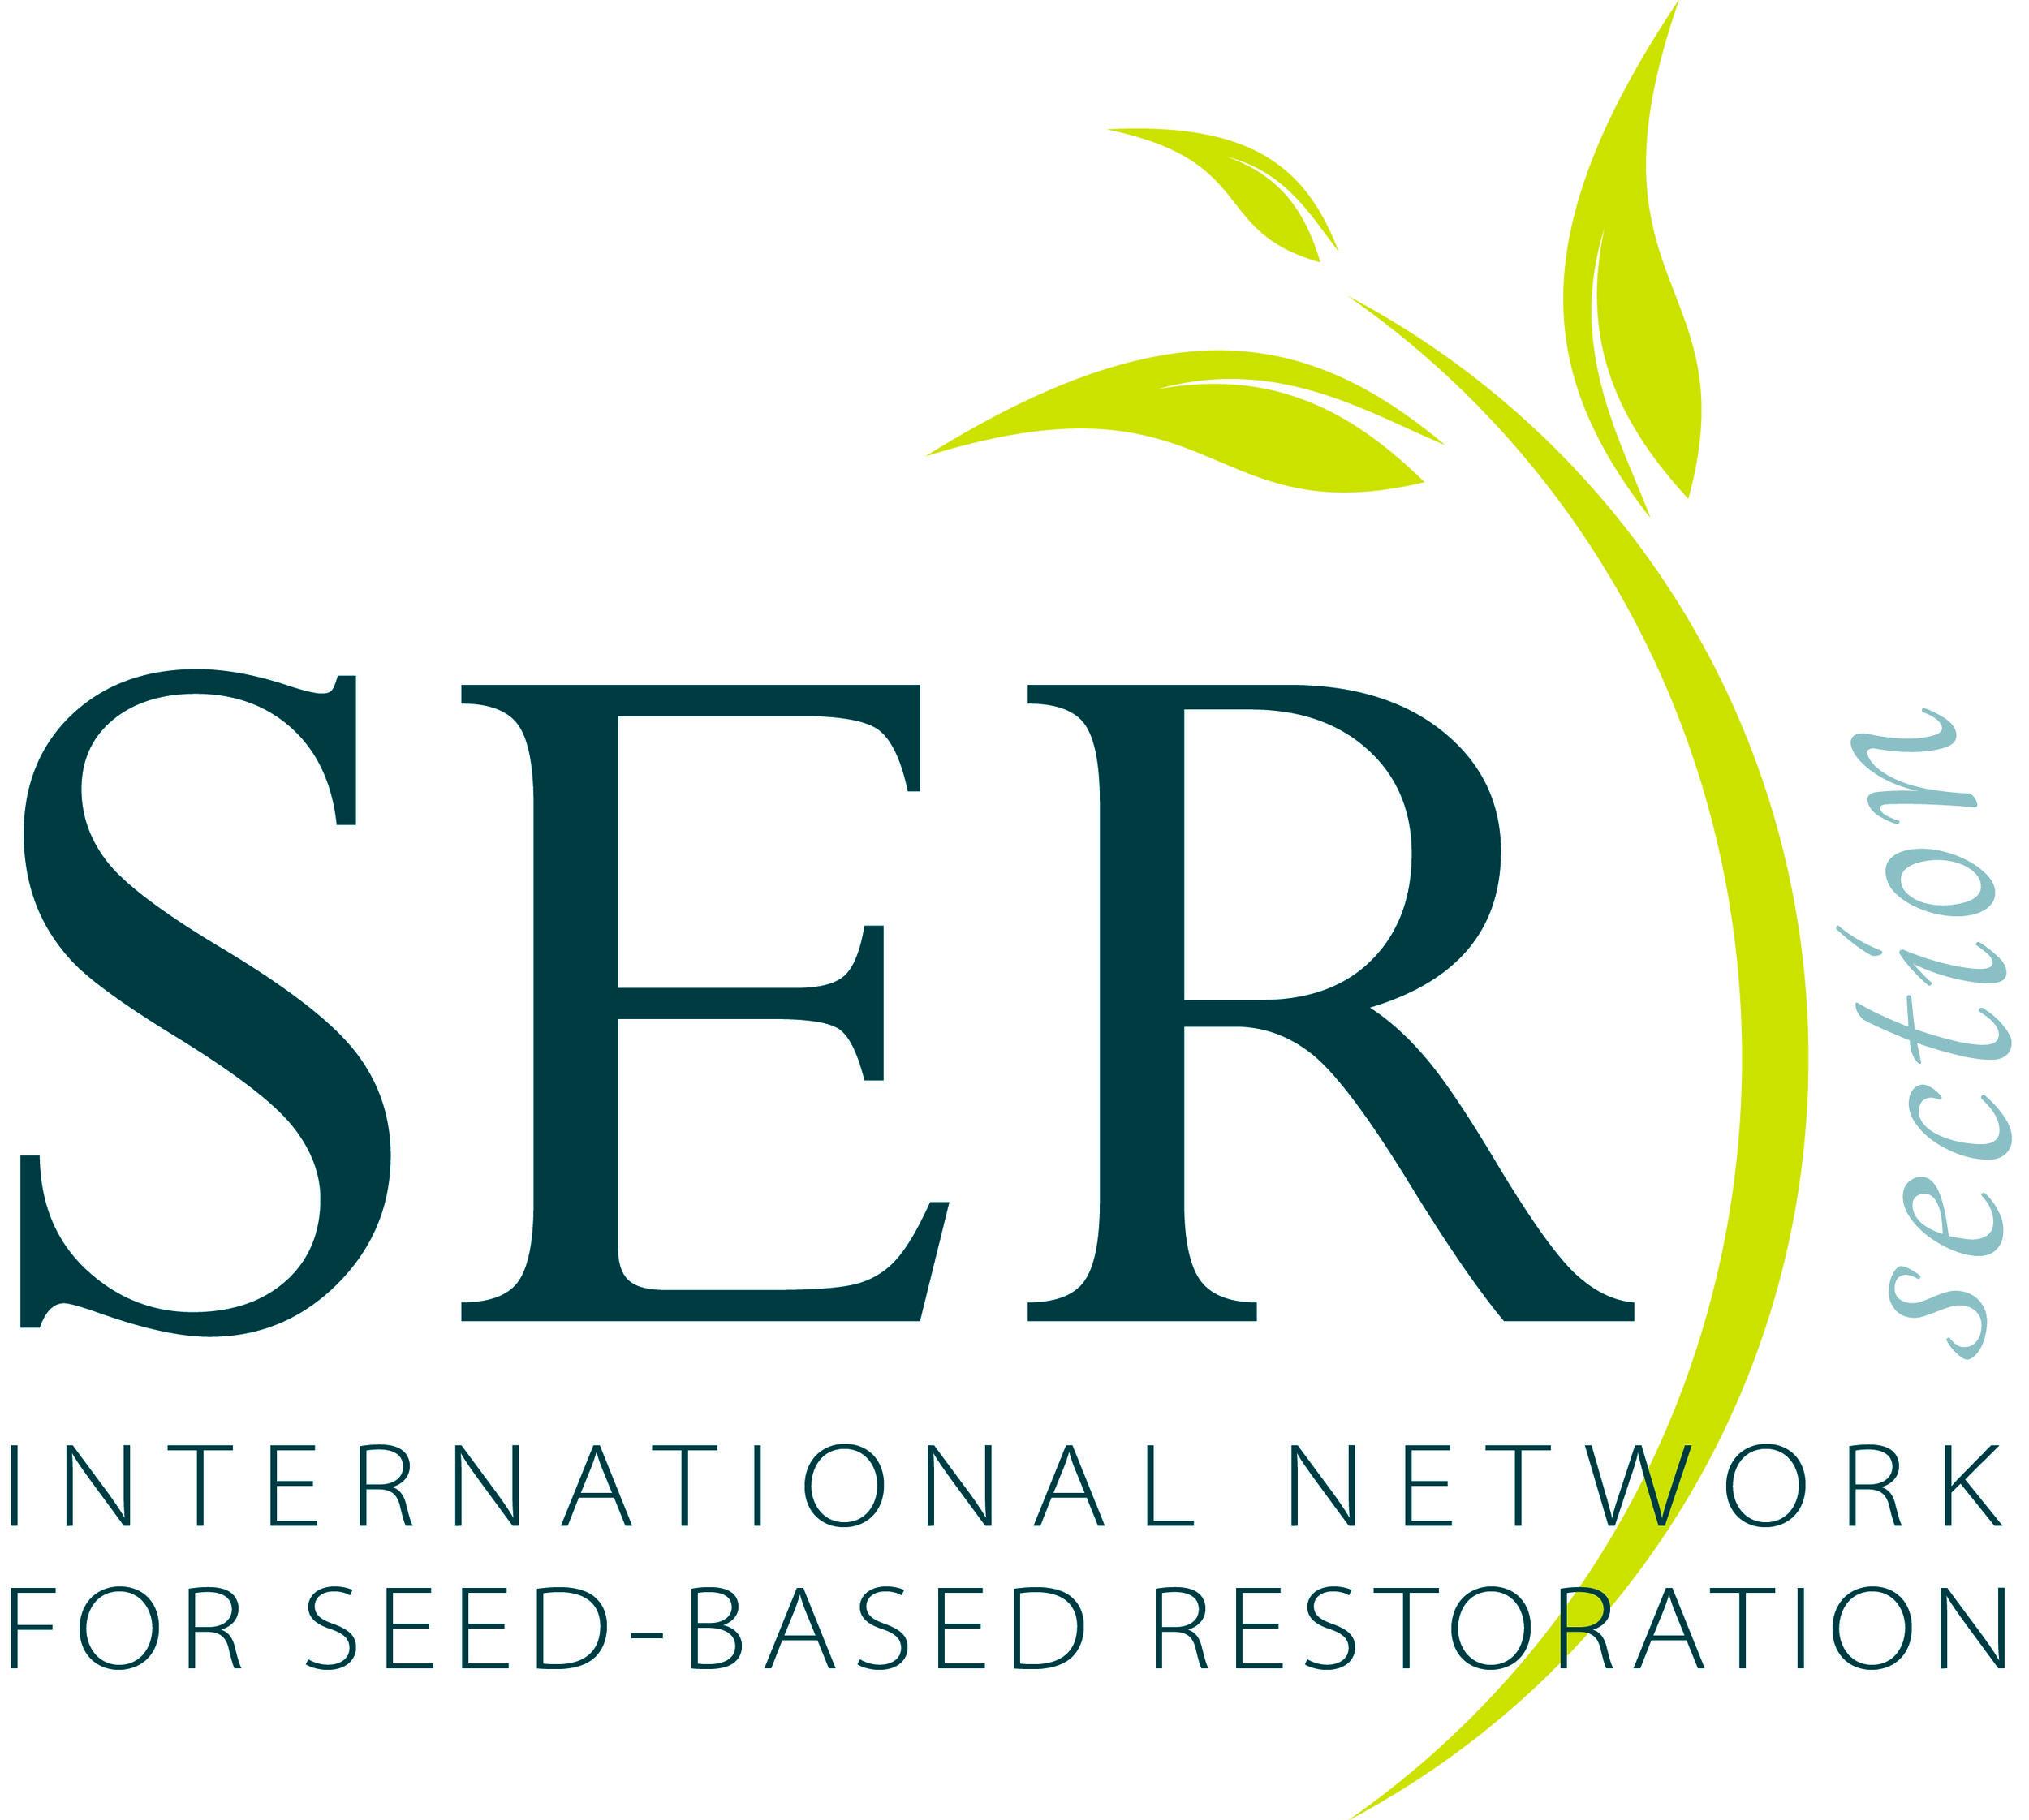 ser section logo_sq_INSR.jpg